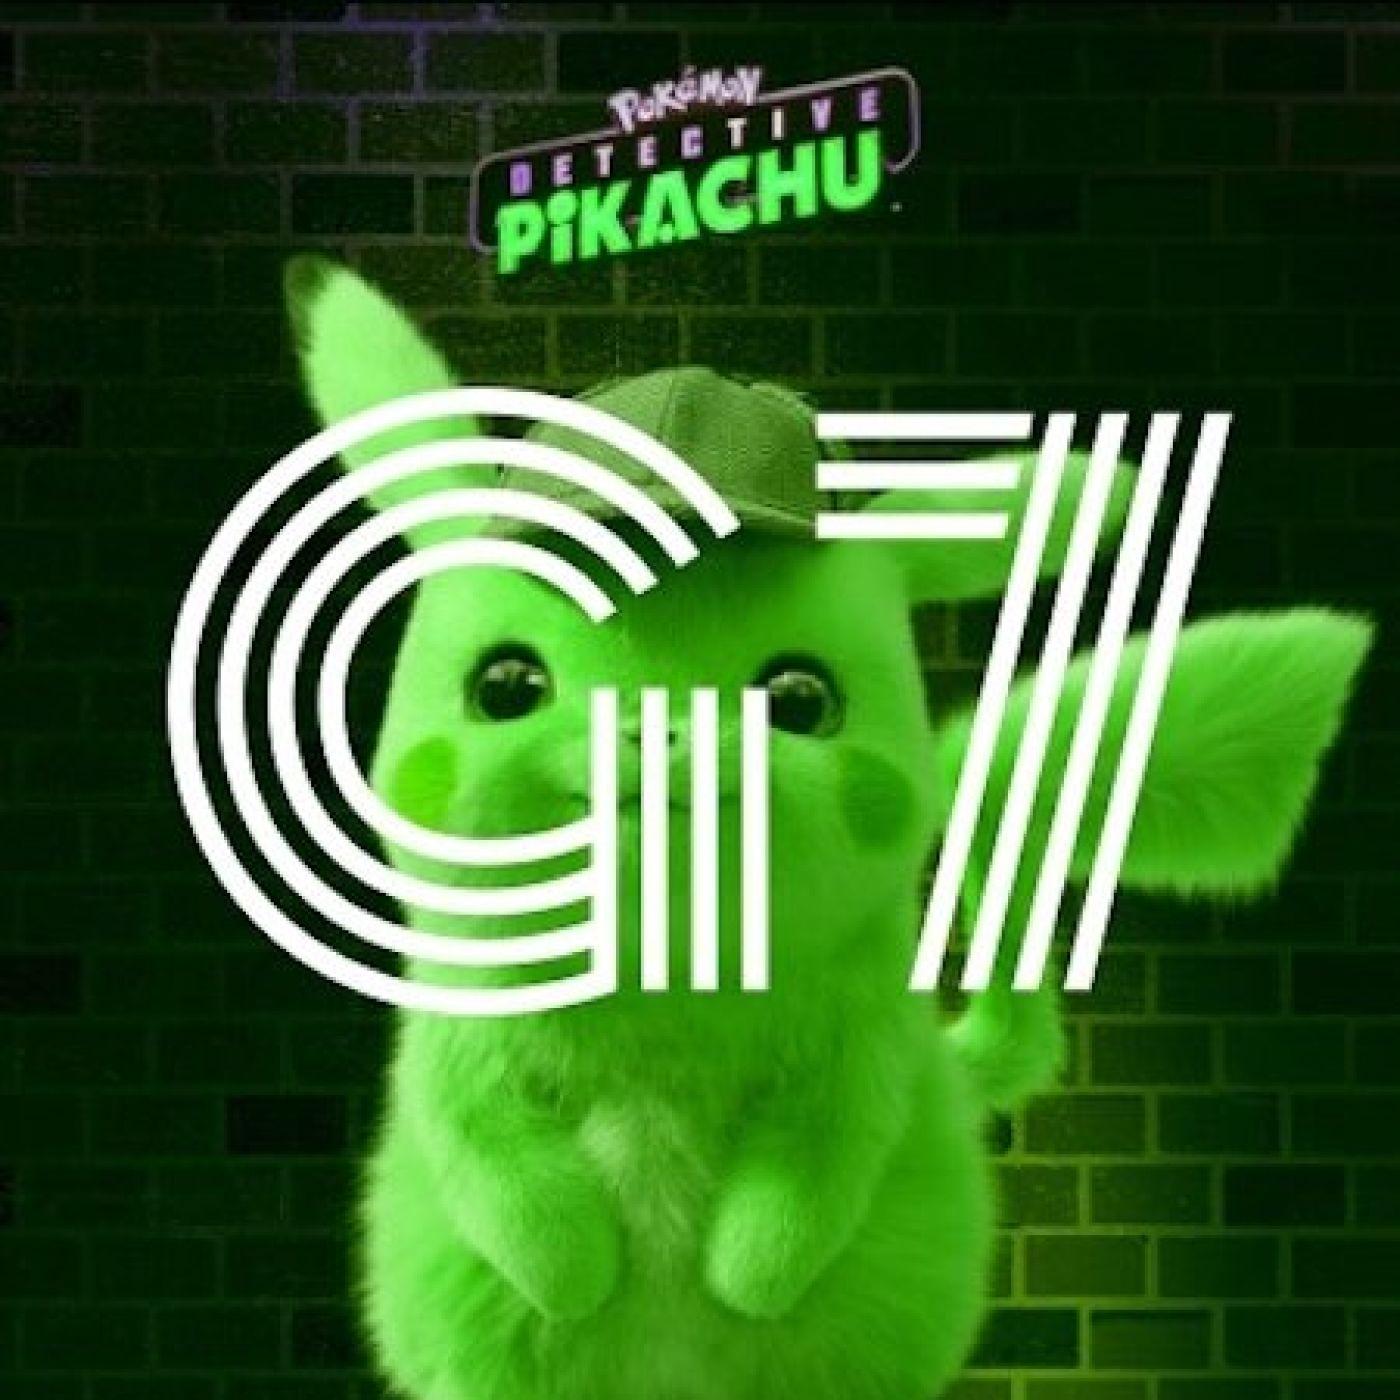 G7 - Episode 7 - Pokemon Detective Pikachu